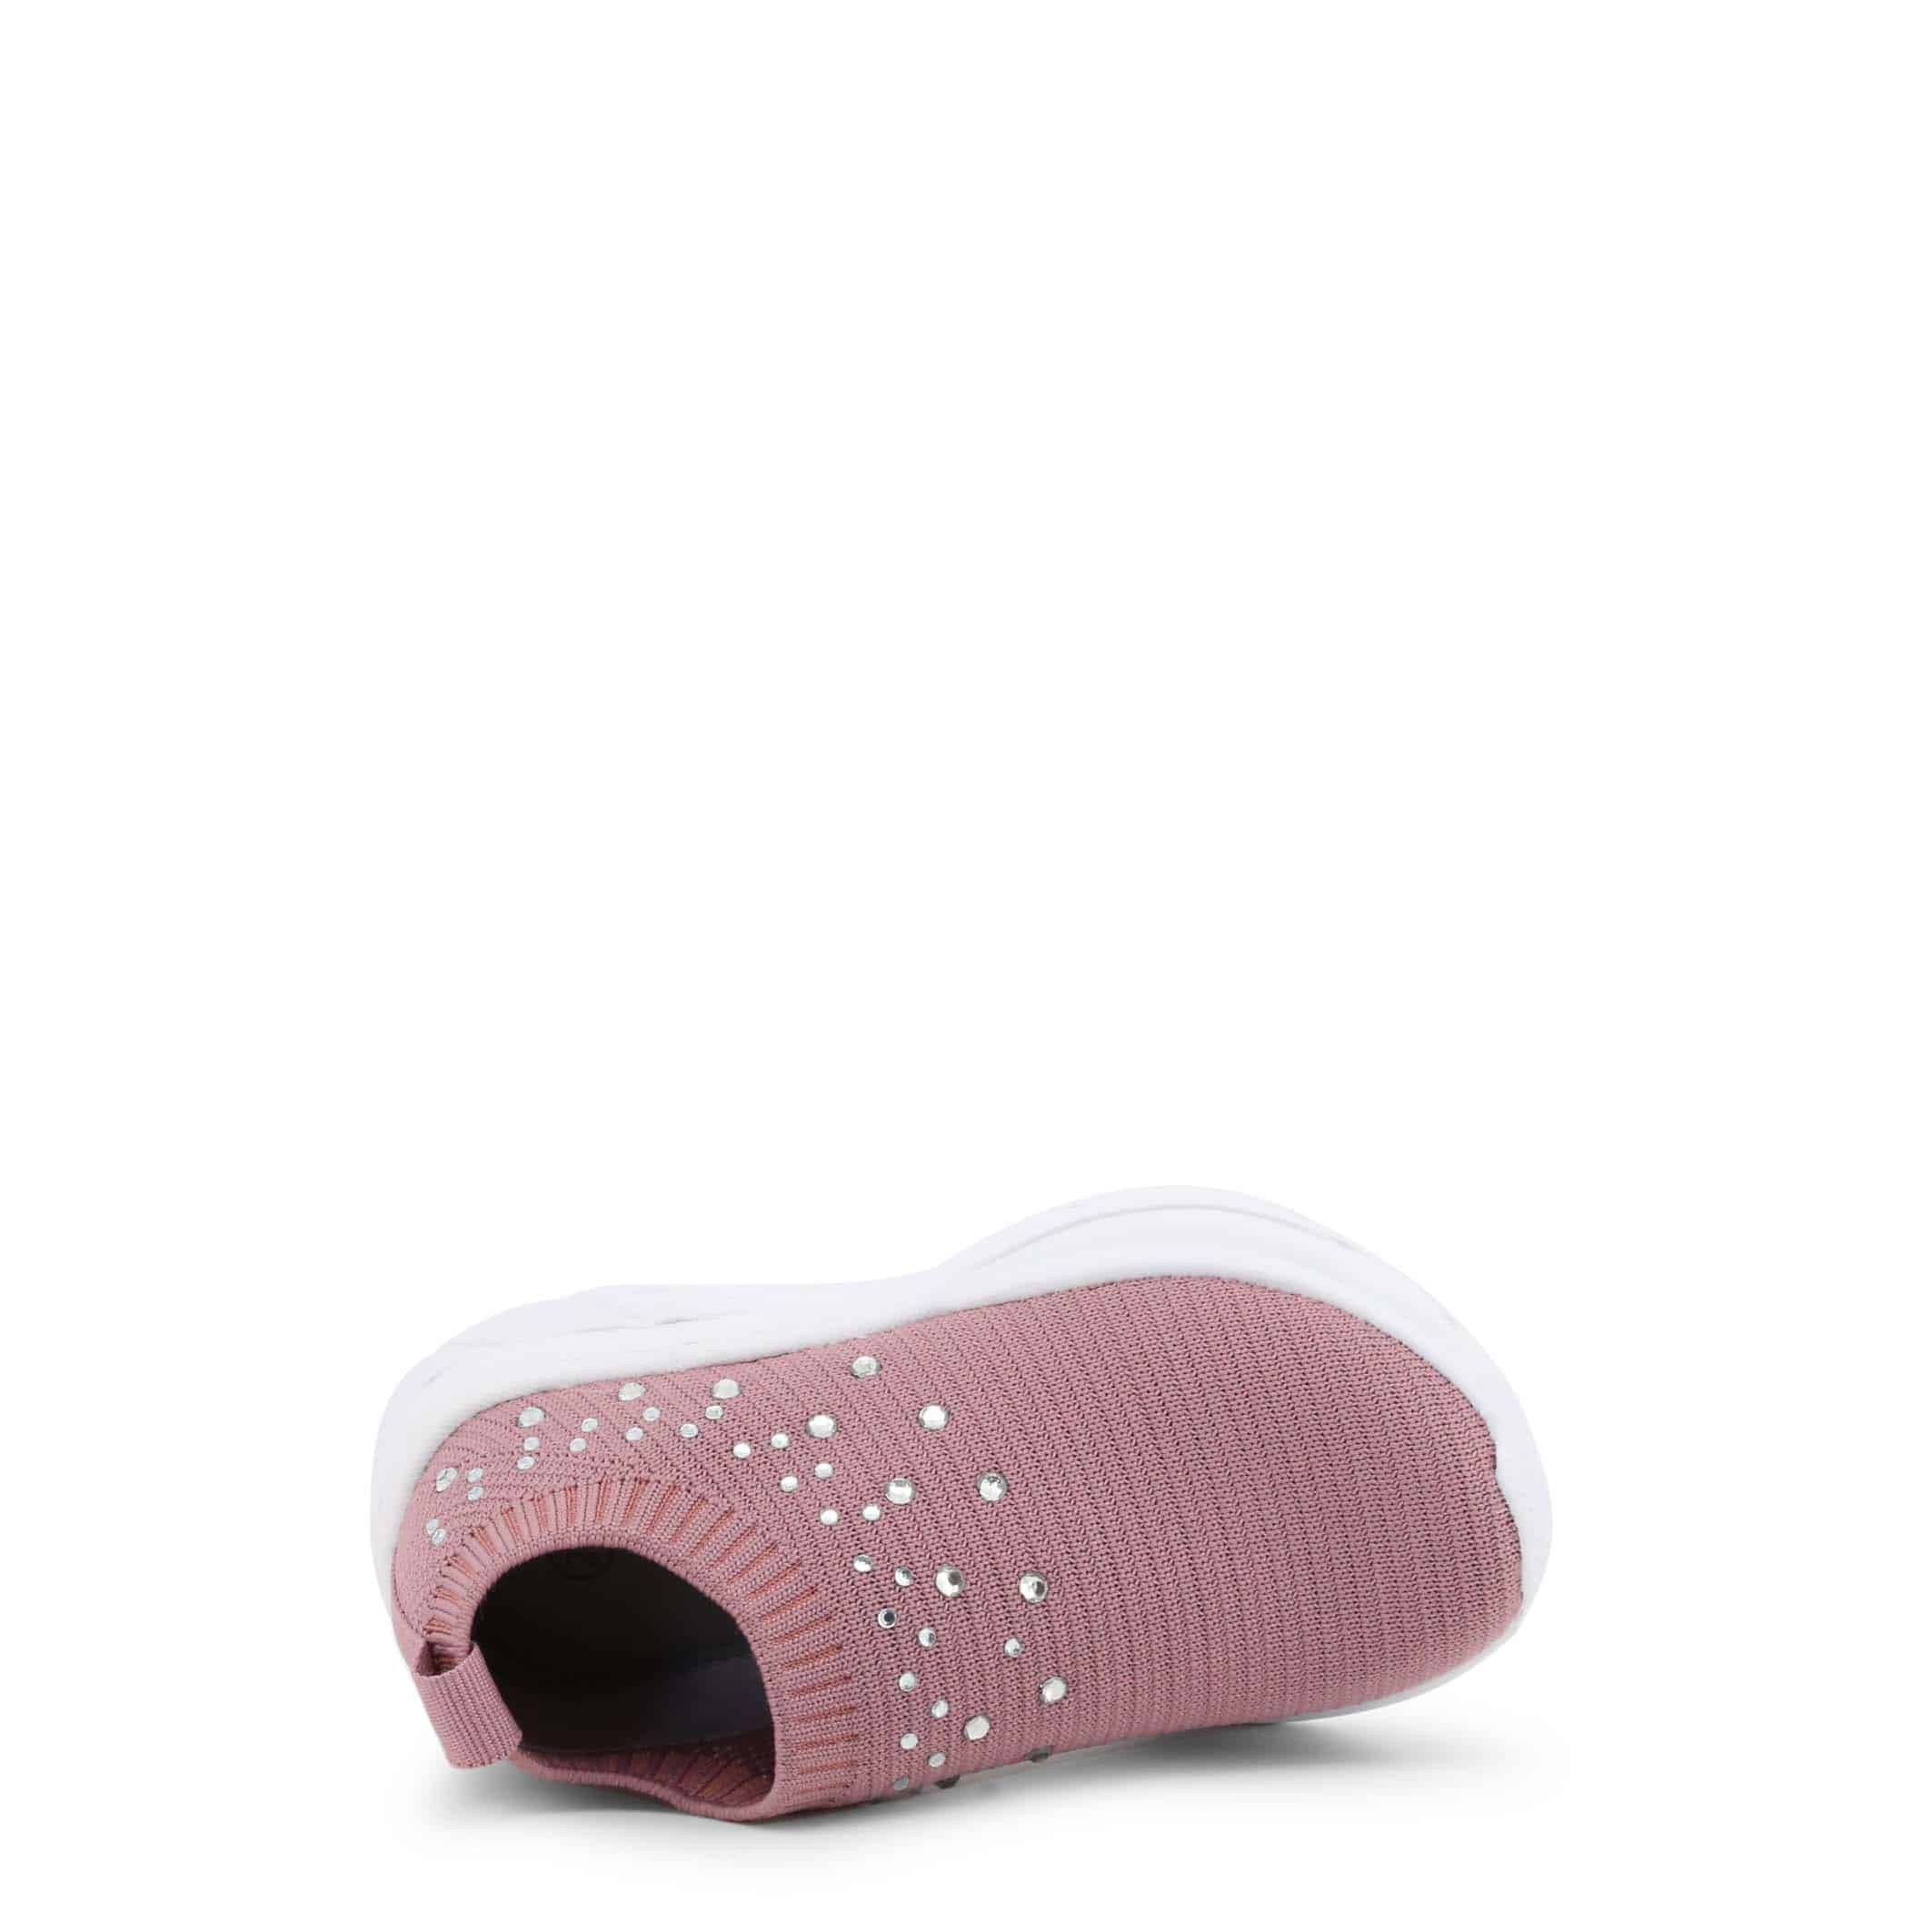 Shone – 1601-001 – Roze Designeritems.nl